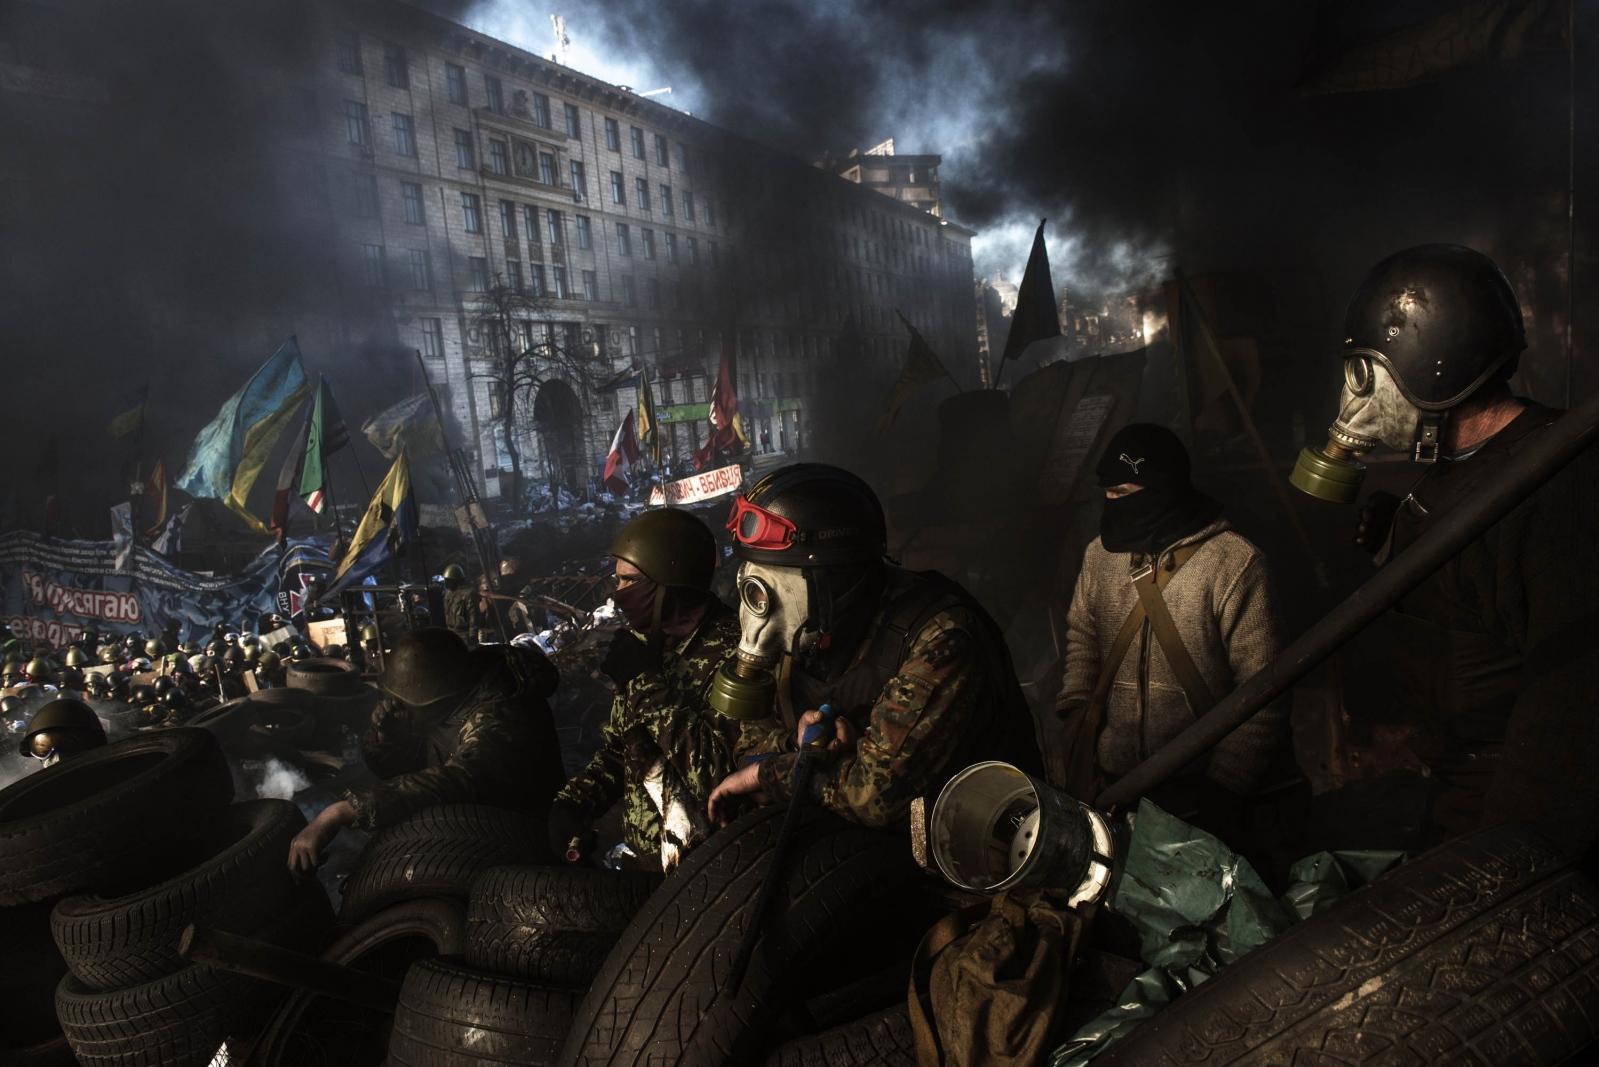 Art and Documentary Photography - Loading Behind_Kiev_s_barricades_002.jpg